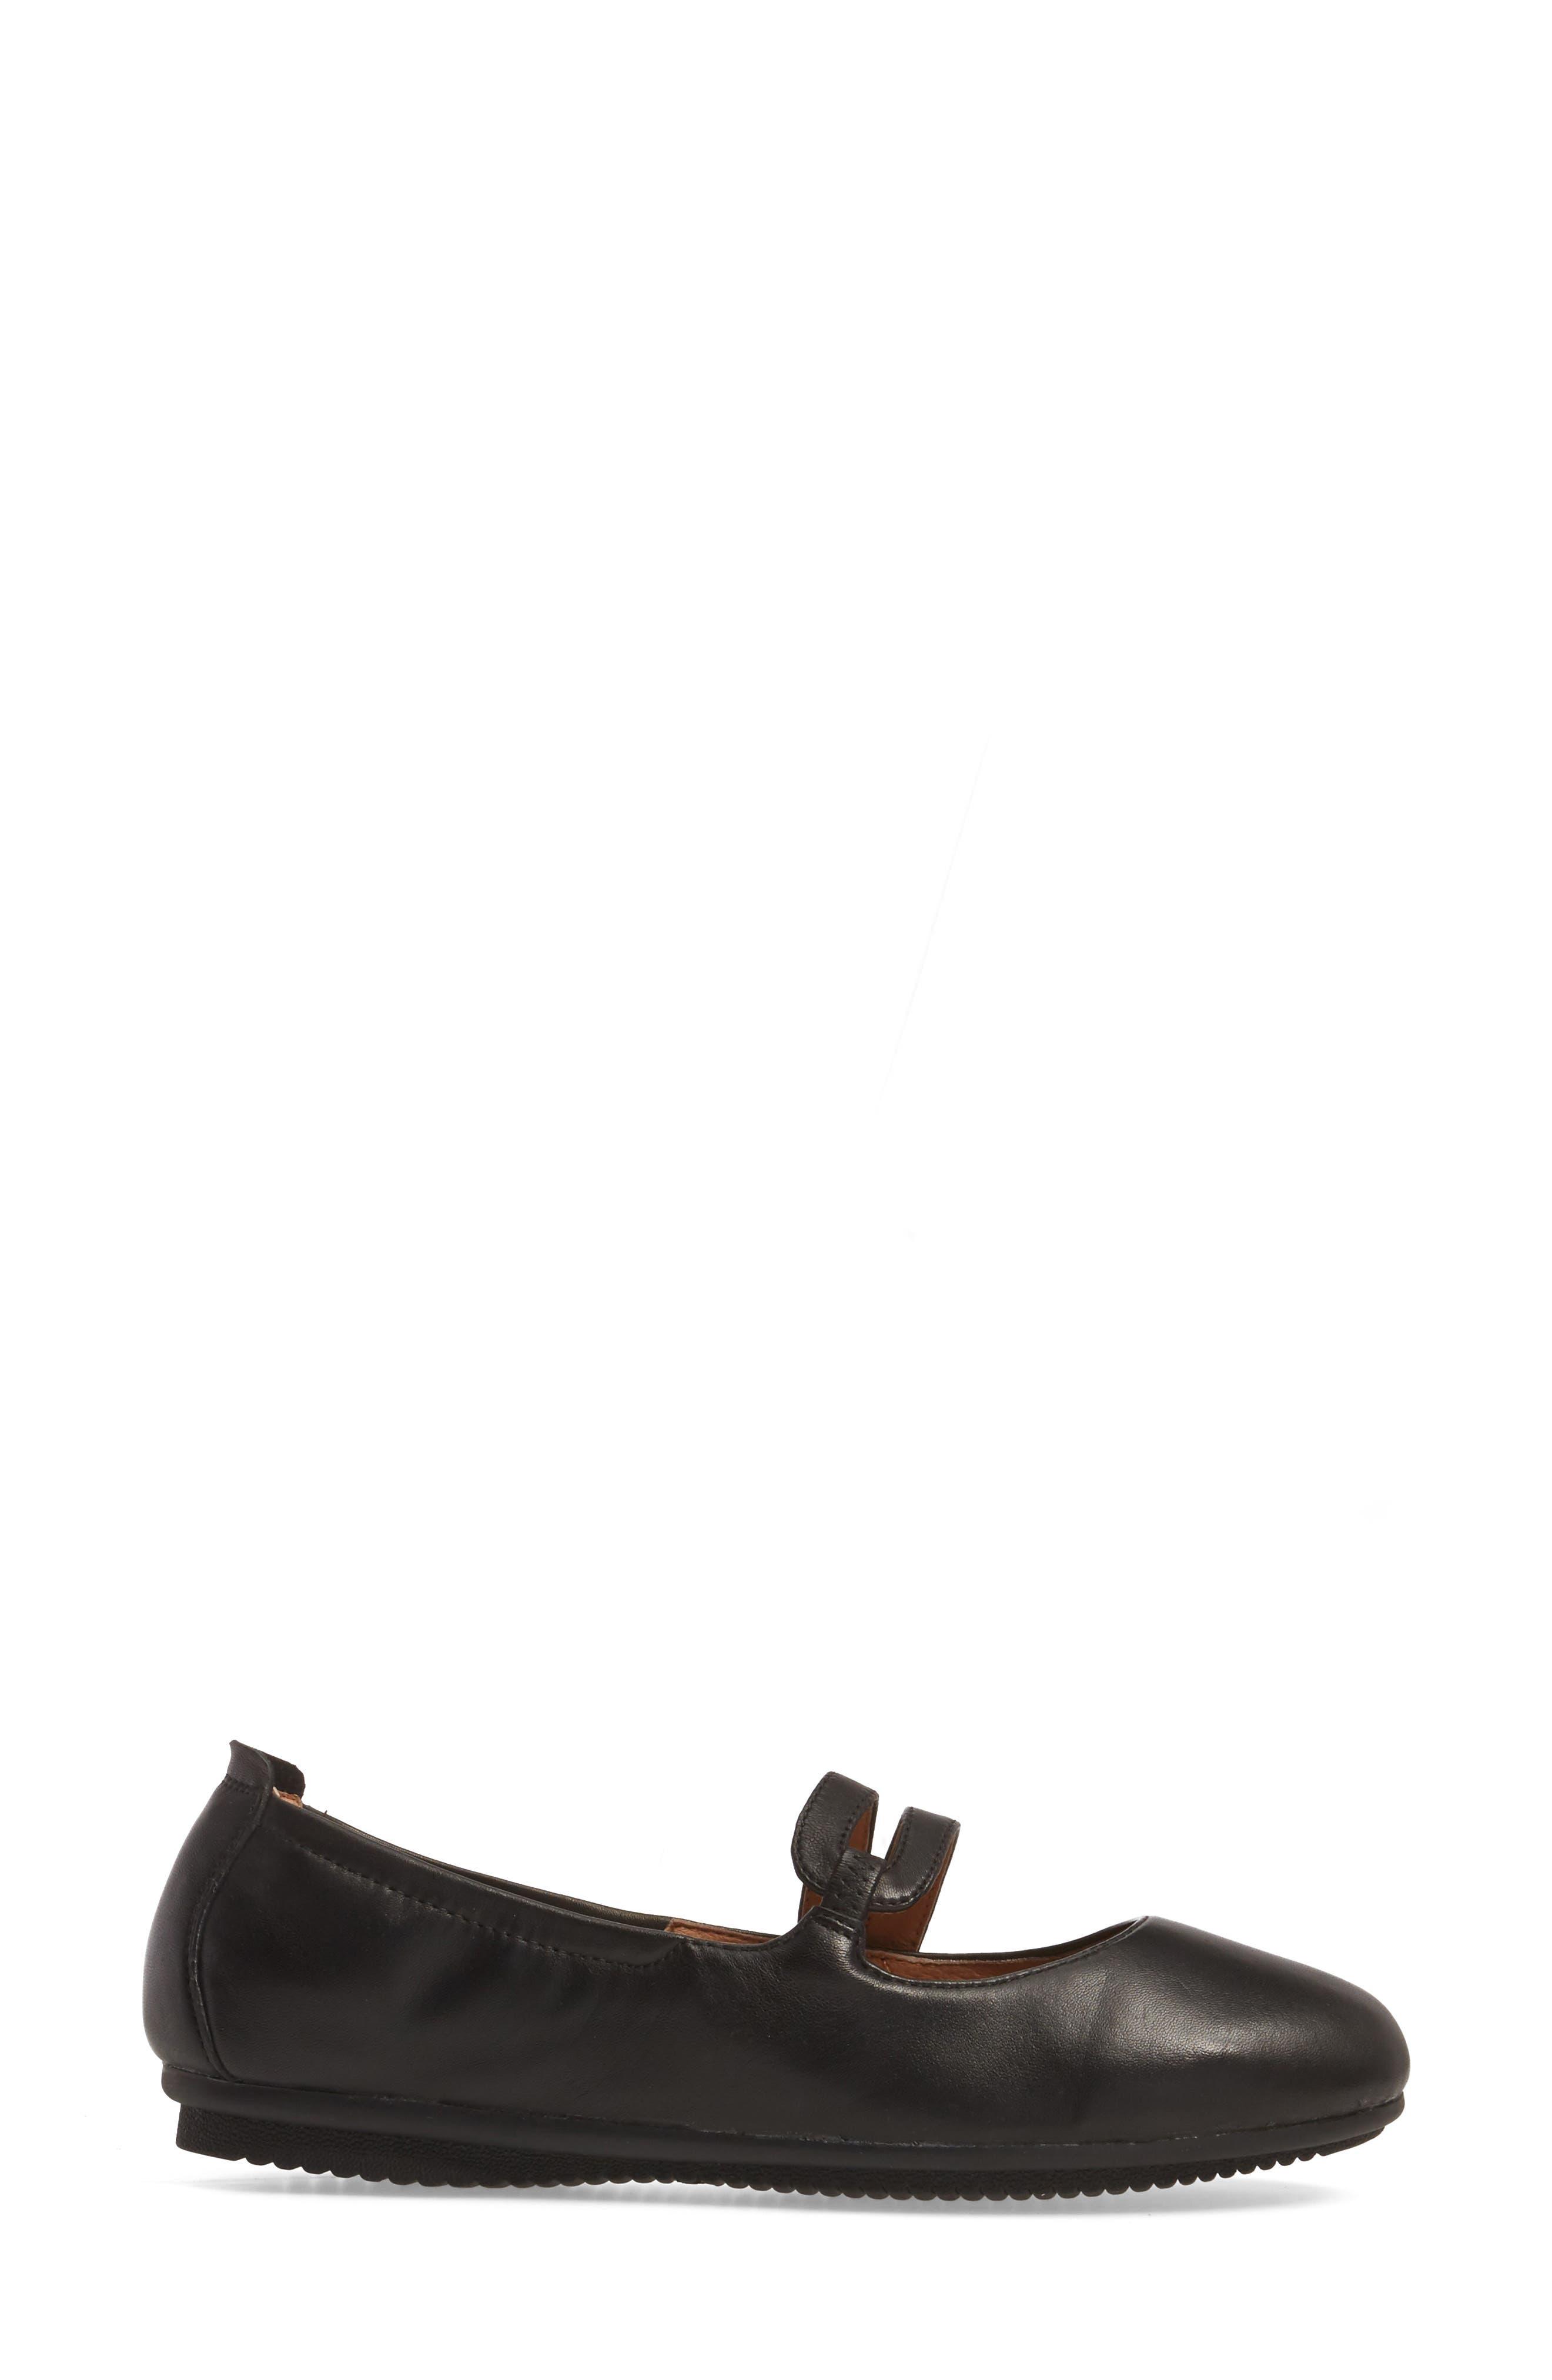 Pippa 63 Flat,                             Alternate thumbnail 3, color,                             Black Leather